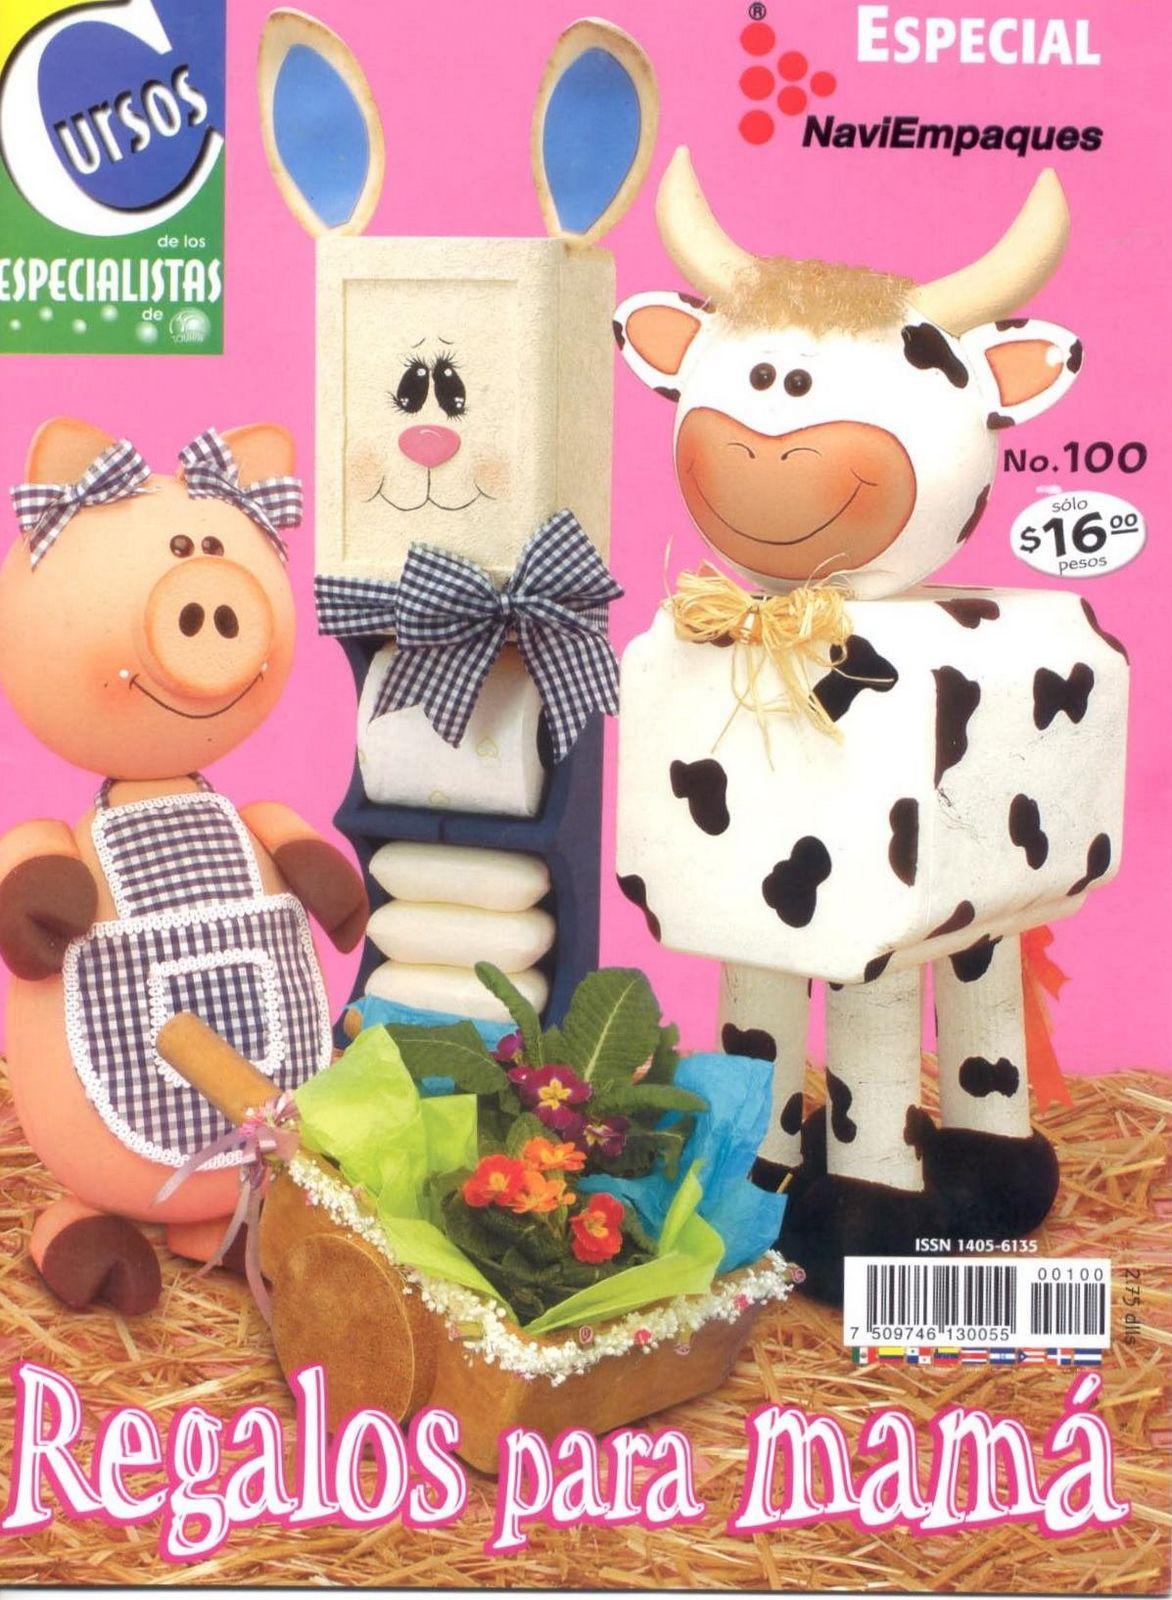 Foami especial regalos para mam variasmanualidades 39 s blog - Regalos para mama manualidades ...